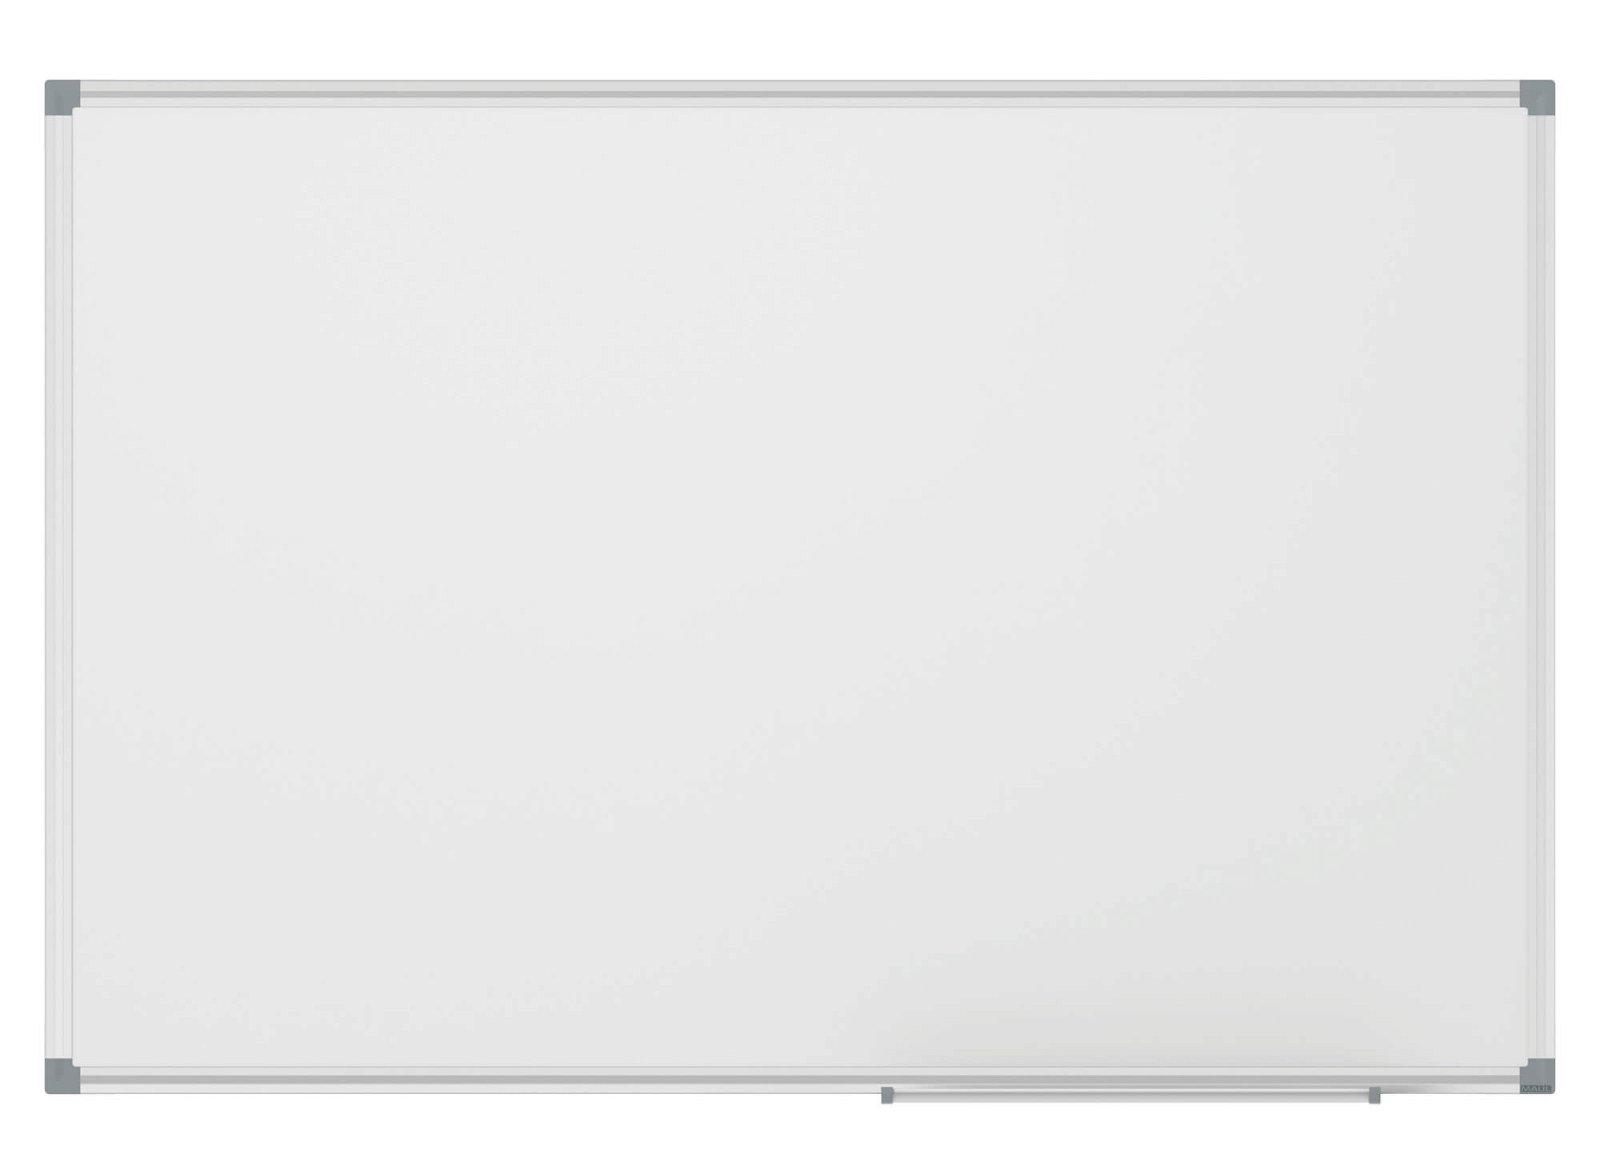 Whiteboard MAULstandard, 45x60 cm, grau